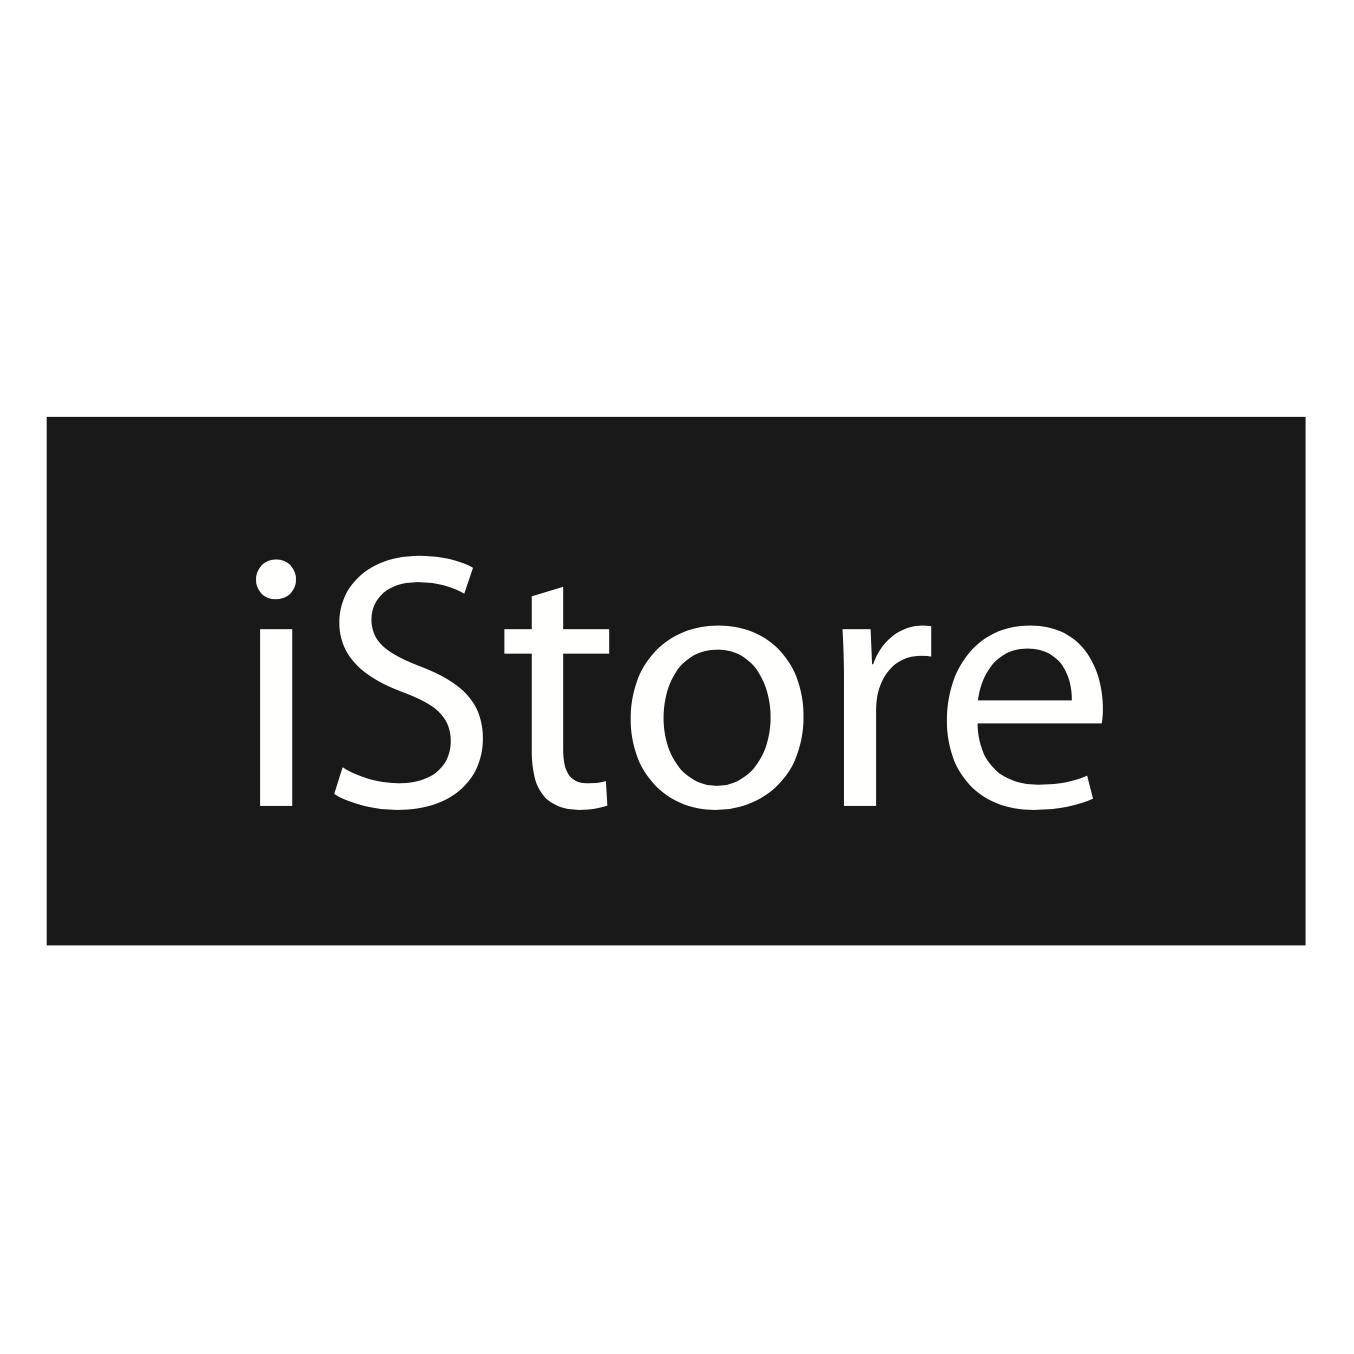 Jack Spade Comold Inlay for iPhone X - Racing Stripe Grey/Black